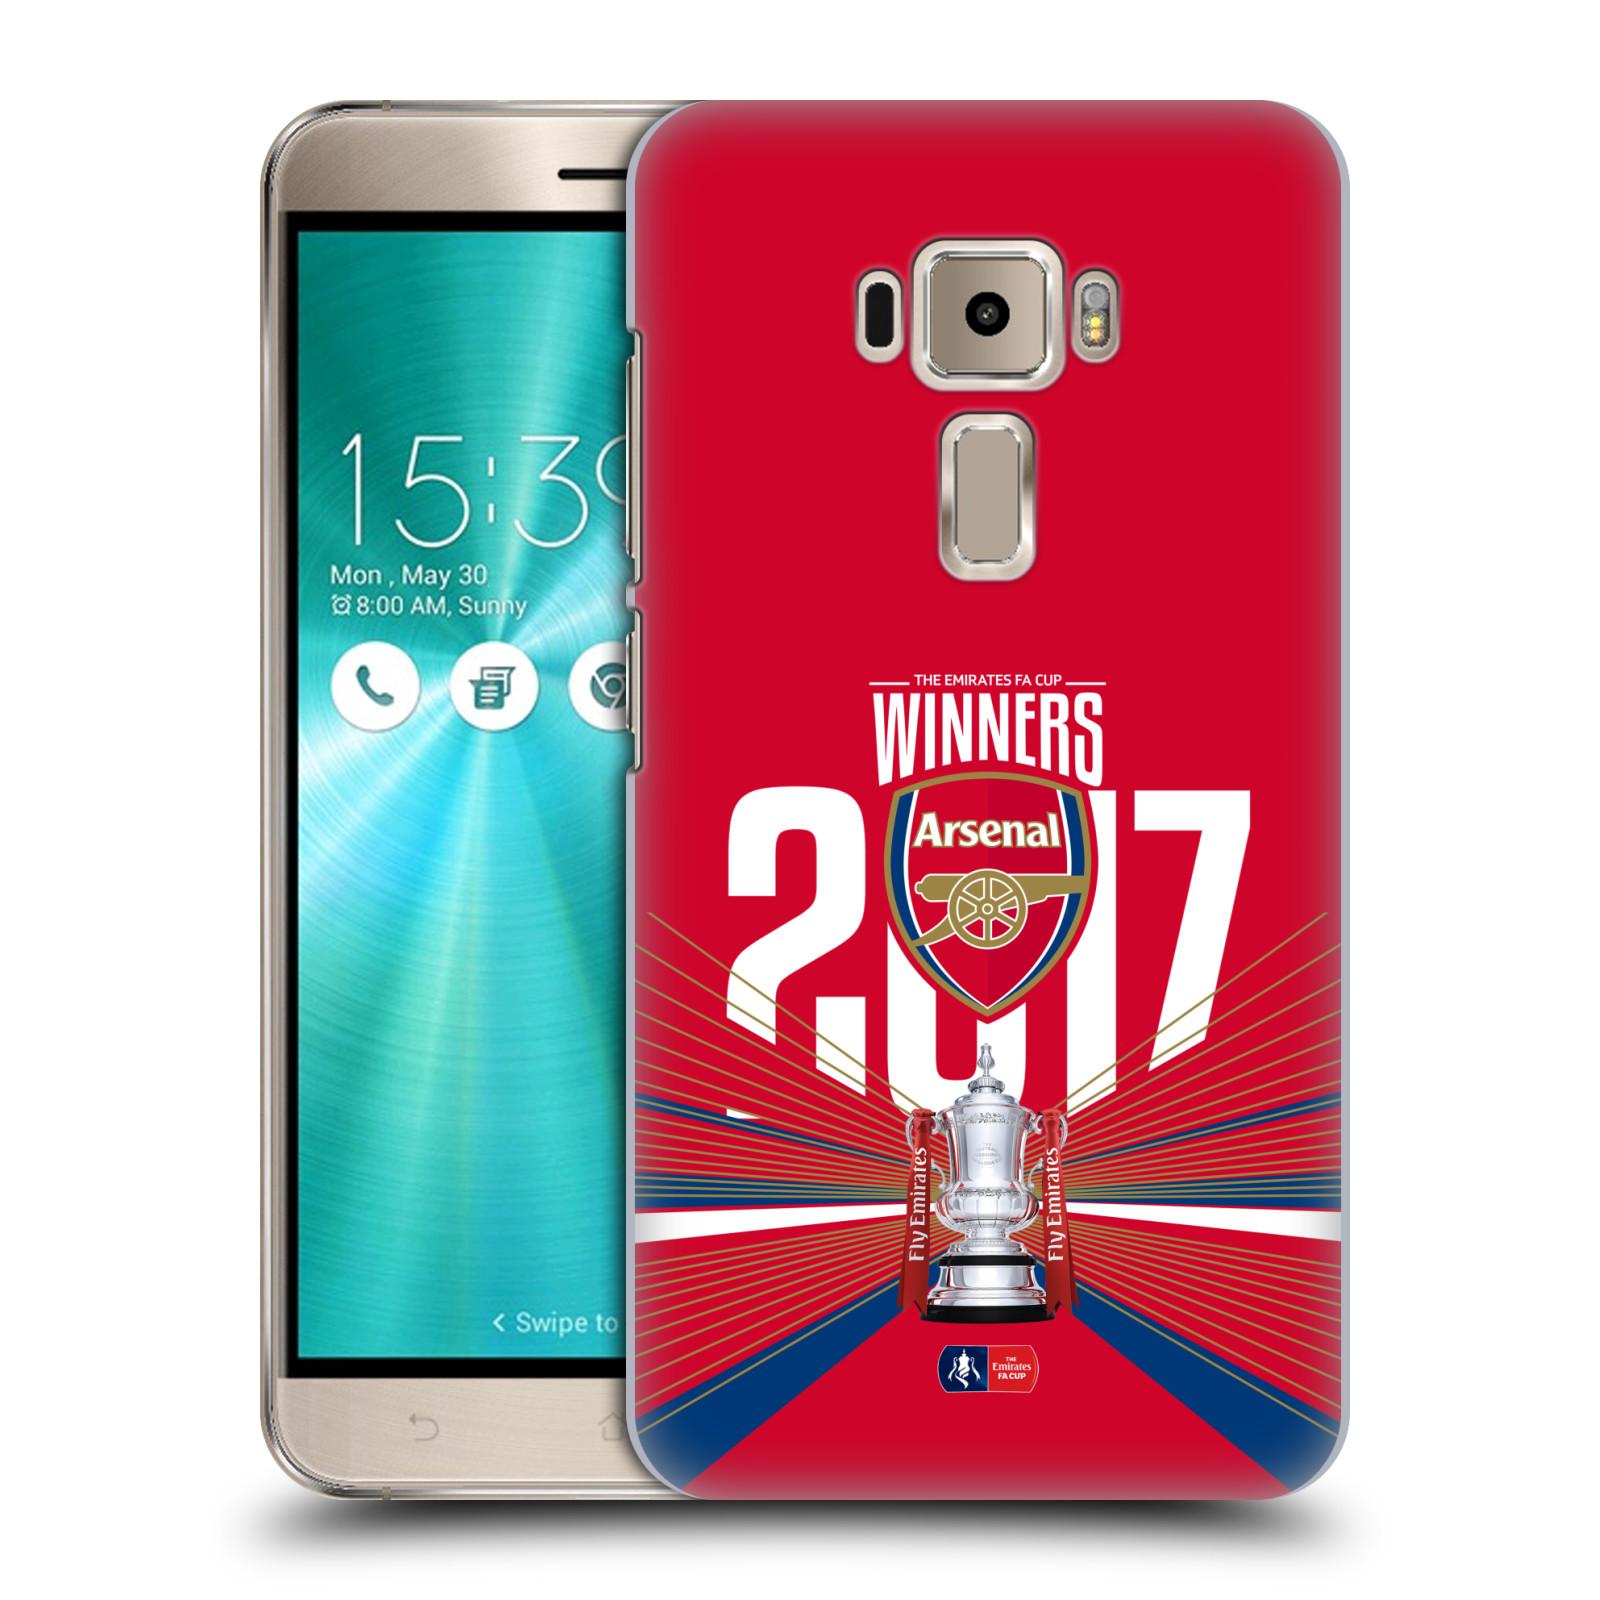 Plastové pouzdro na mobil Asus ZenFone 3 ZE520KL - Head Case - Arsenal FC - Trophy